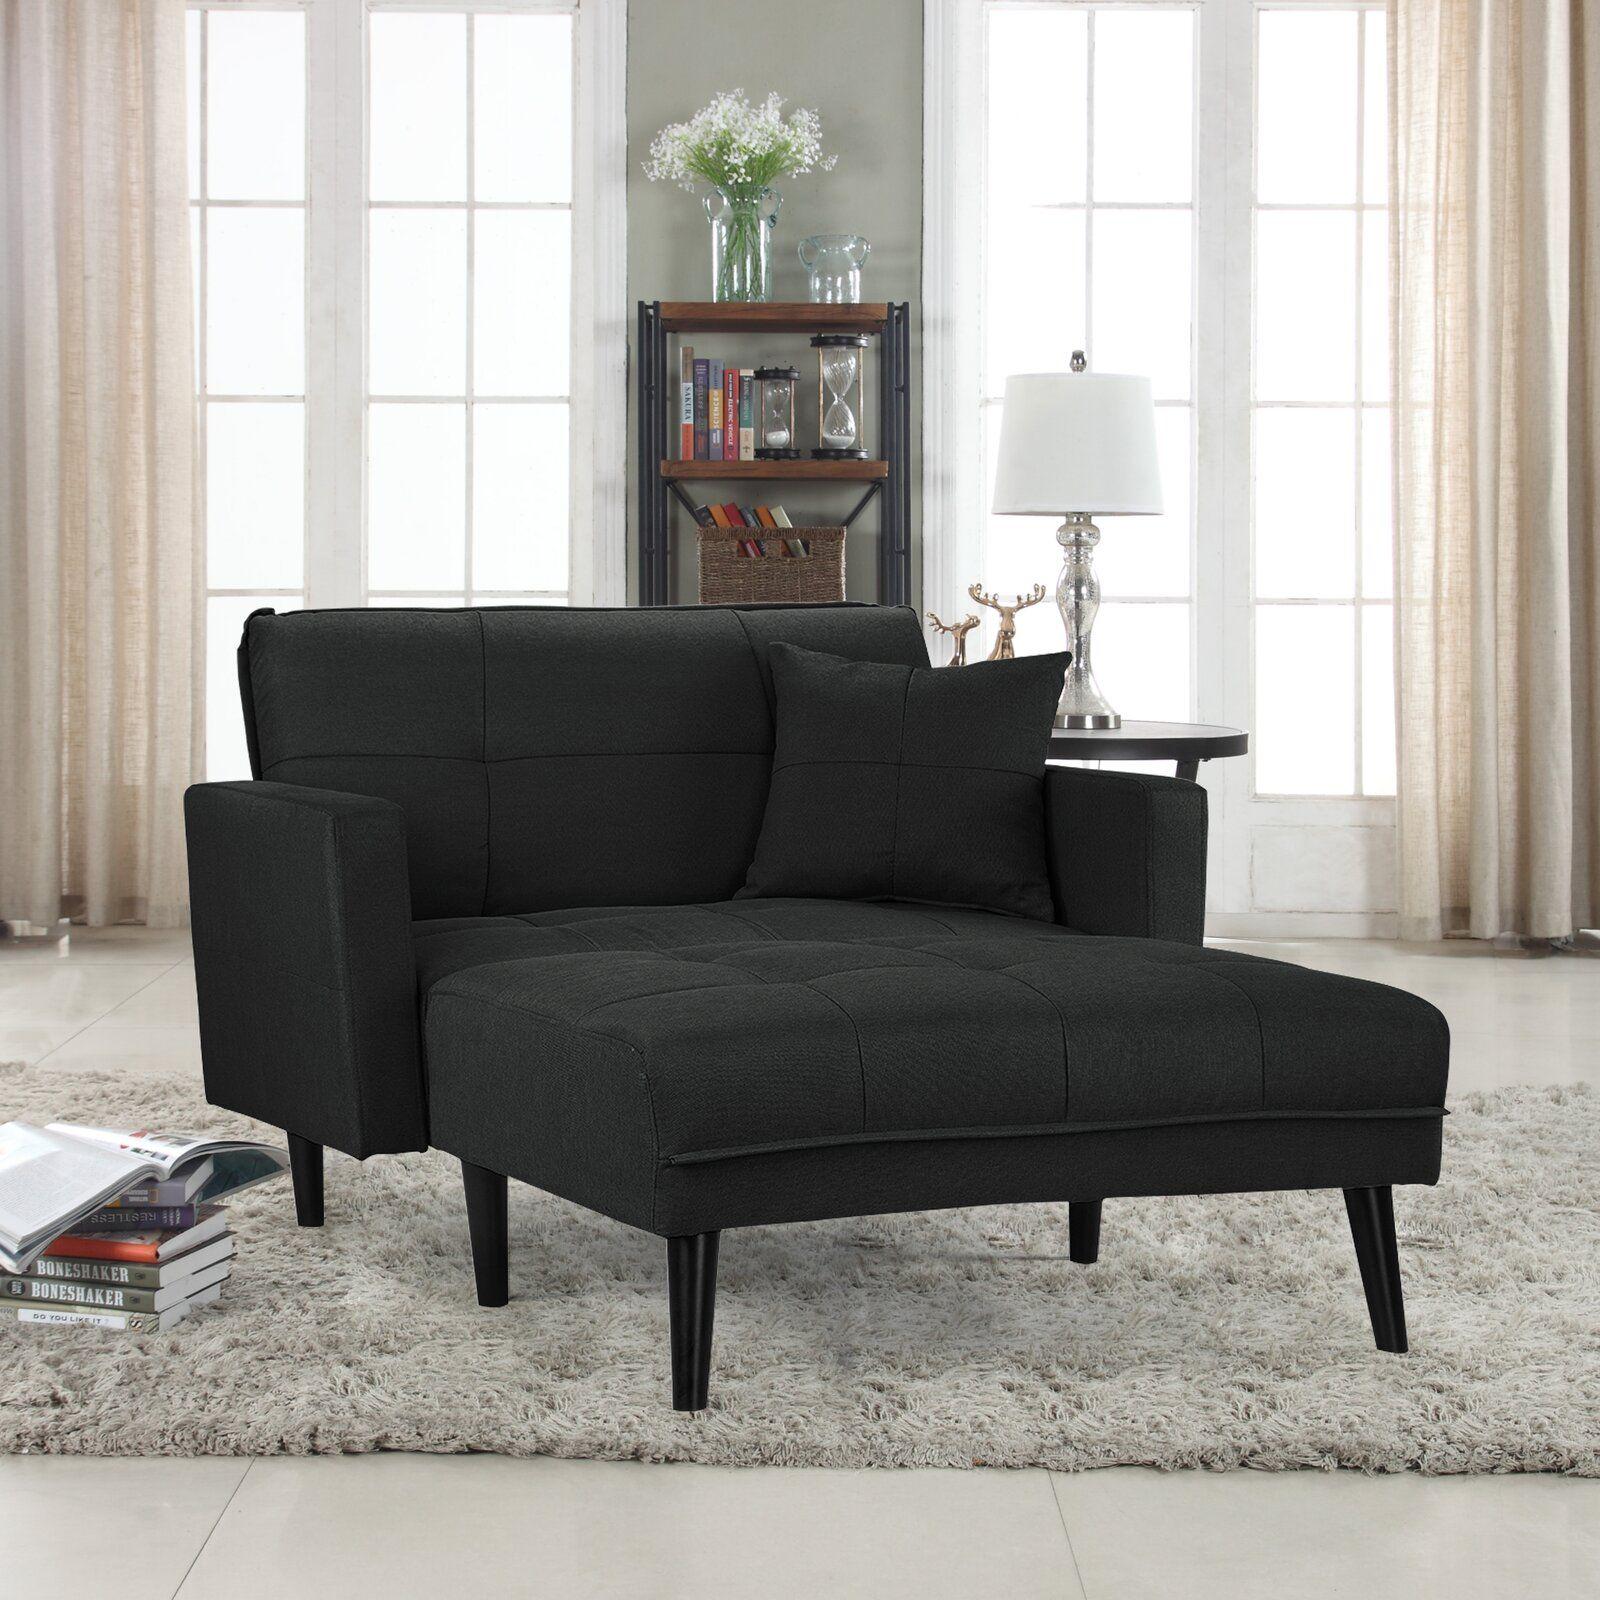 Zipcode Design Firman Chaise Lounge Reviews Wayfair Chaise Lounge Sofa Modern Chaise Lounge Chaise Lounge